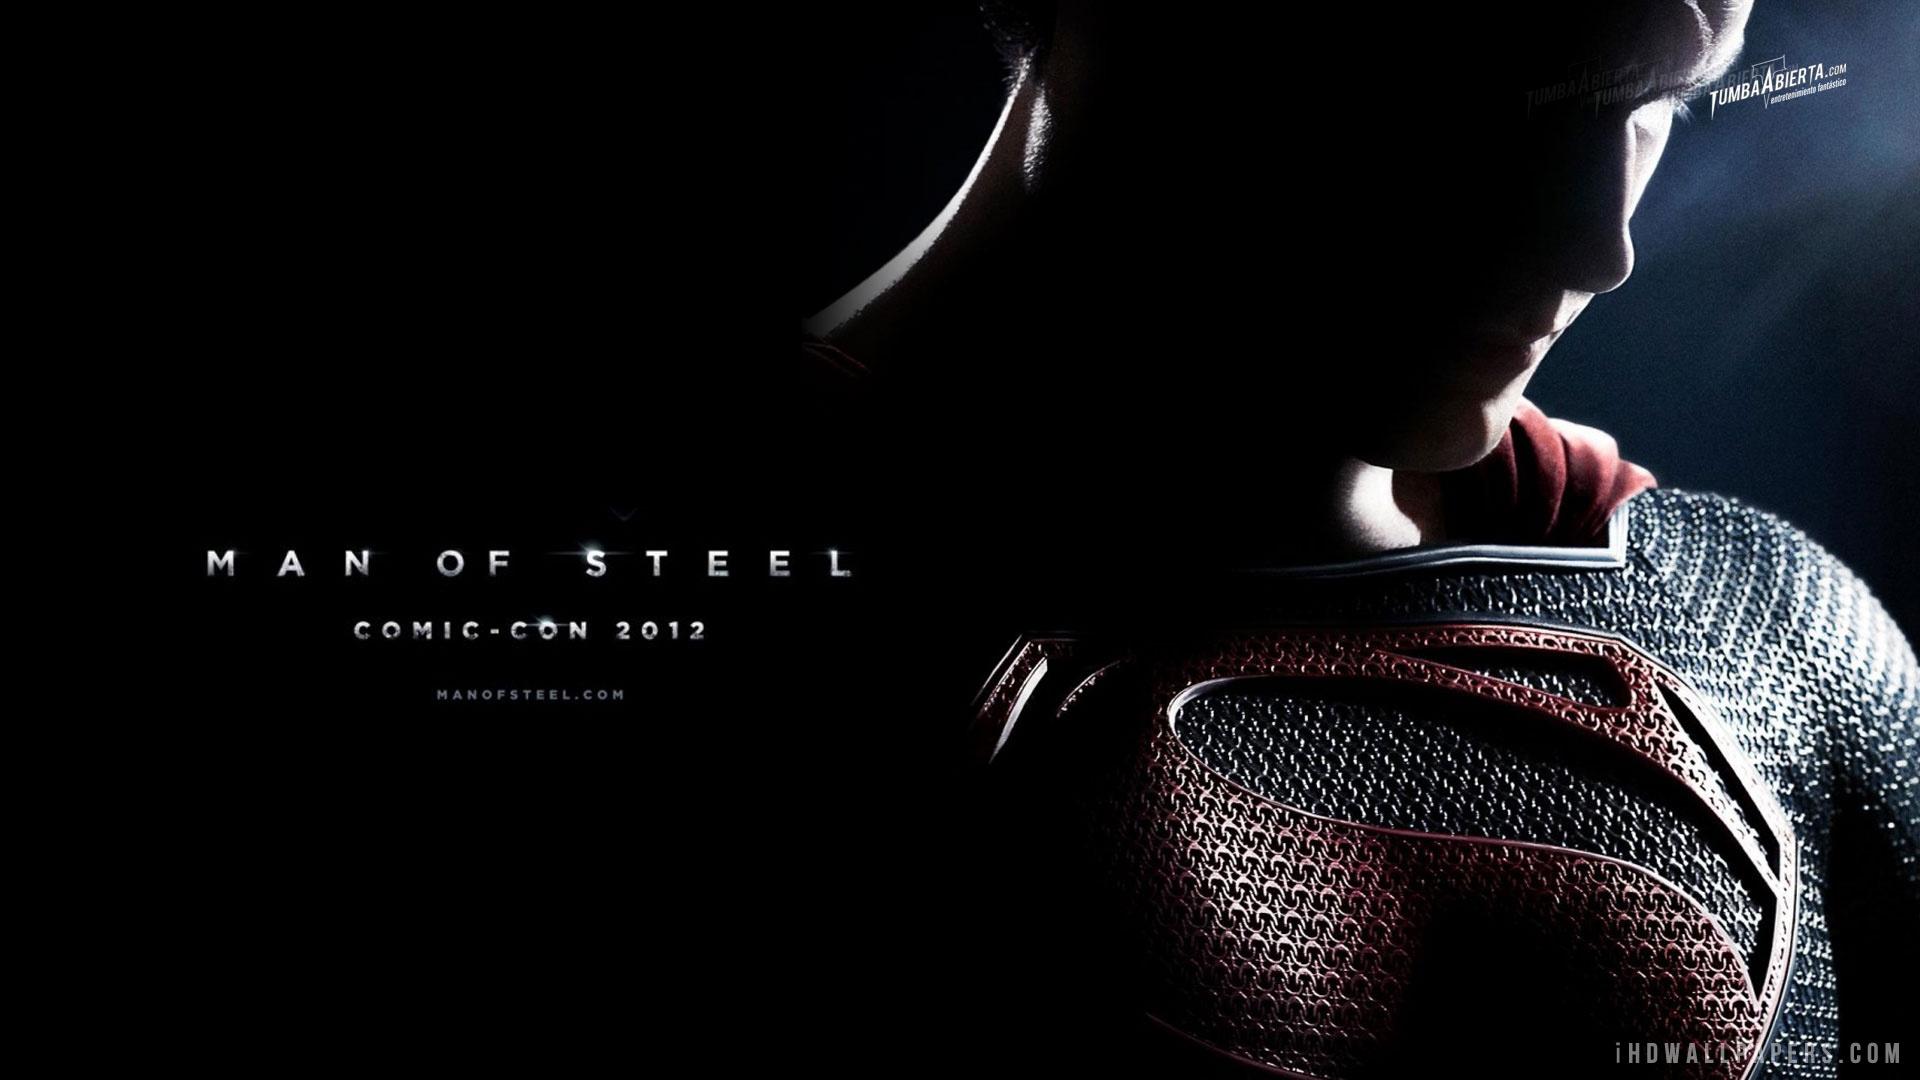 Man of Steel 2013 Movie HD Wallpaper   iHD Wallpapers 1920x1080